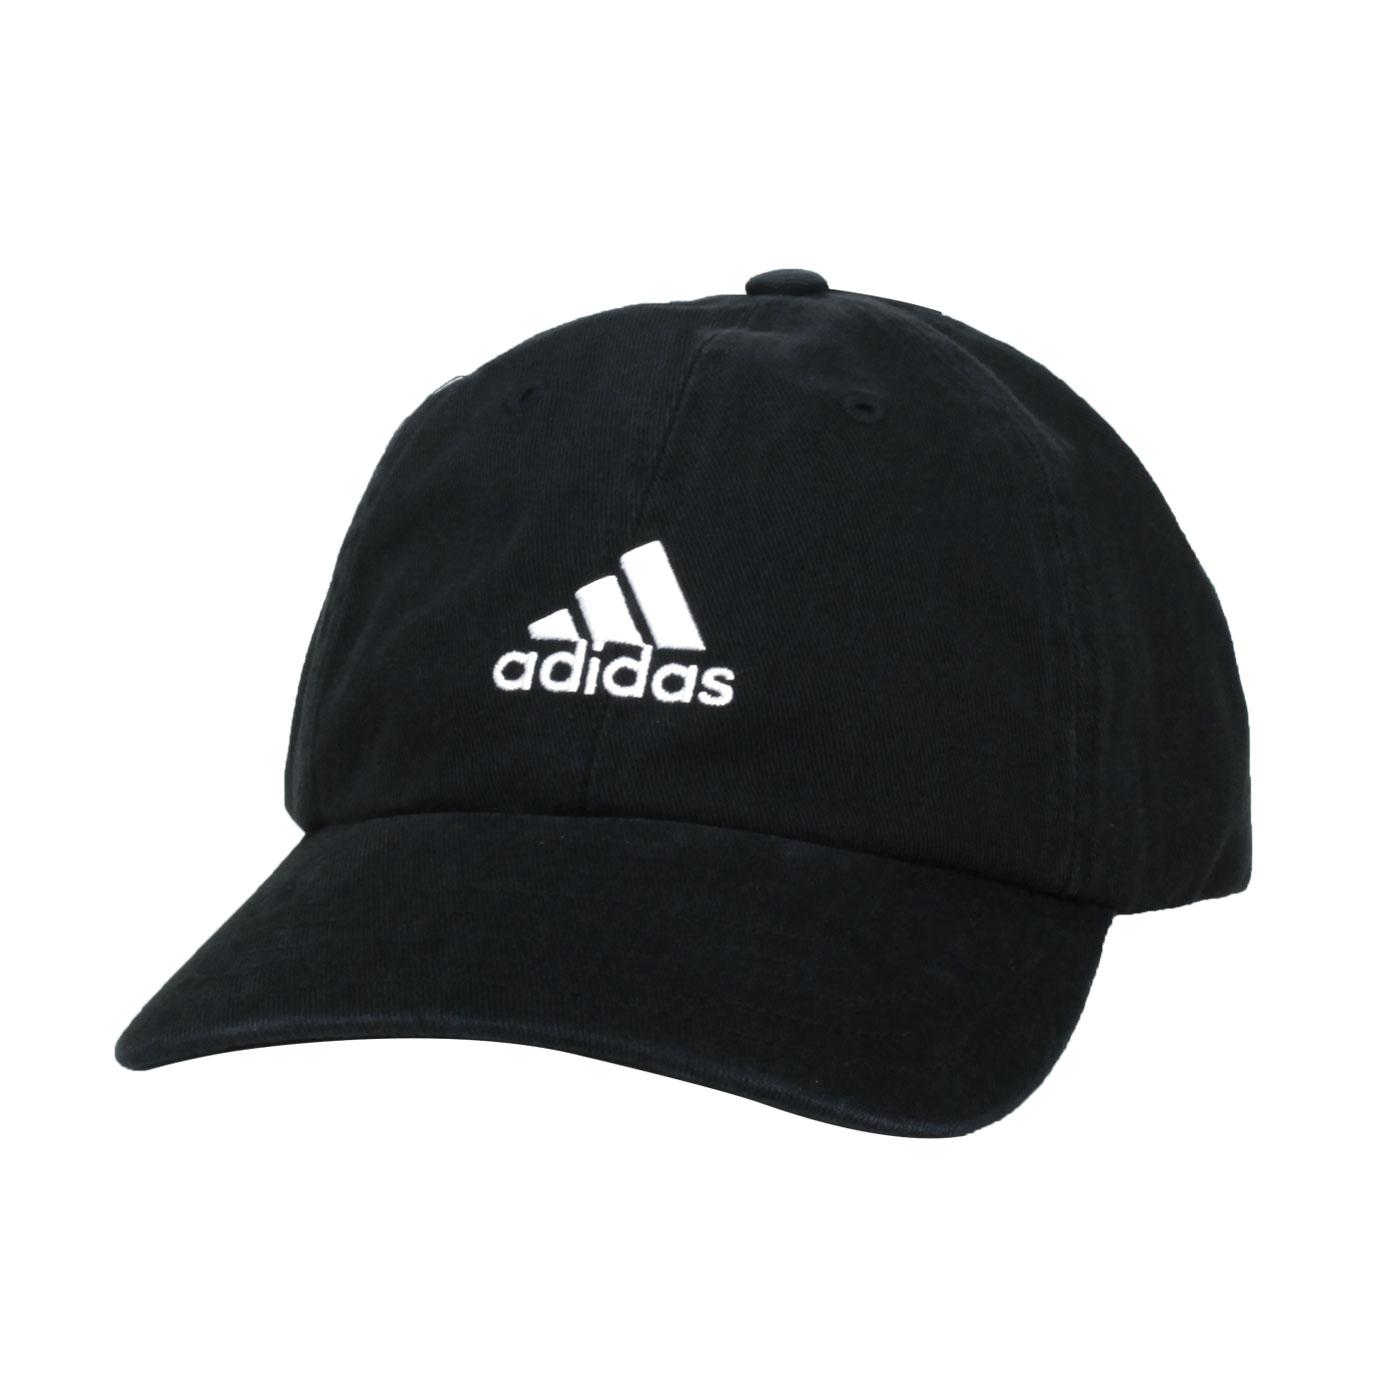 ADIDAS 帽子 FK3189 - 黑白